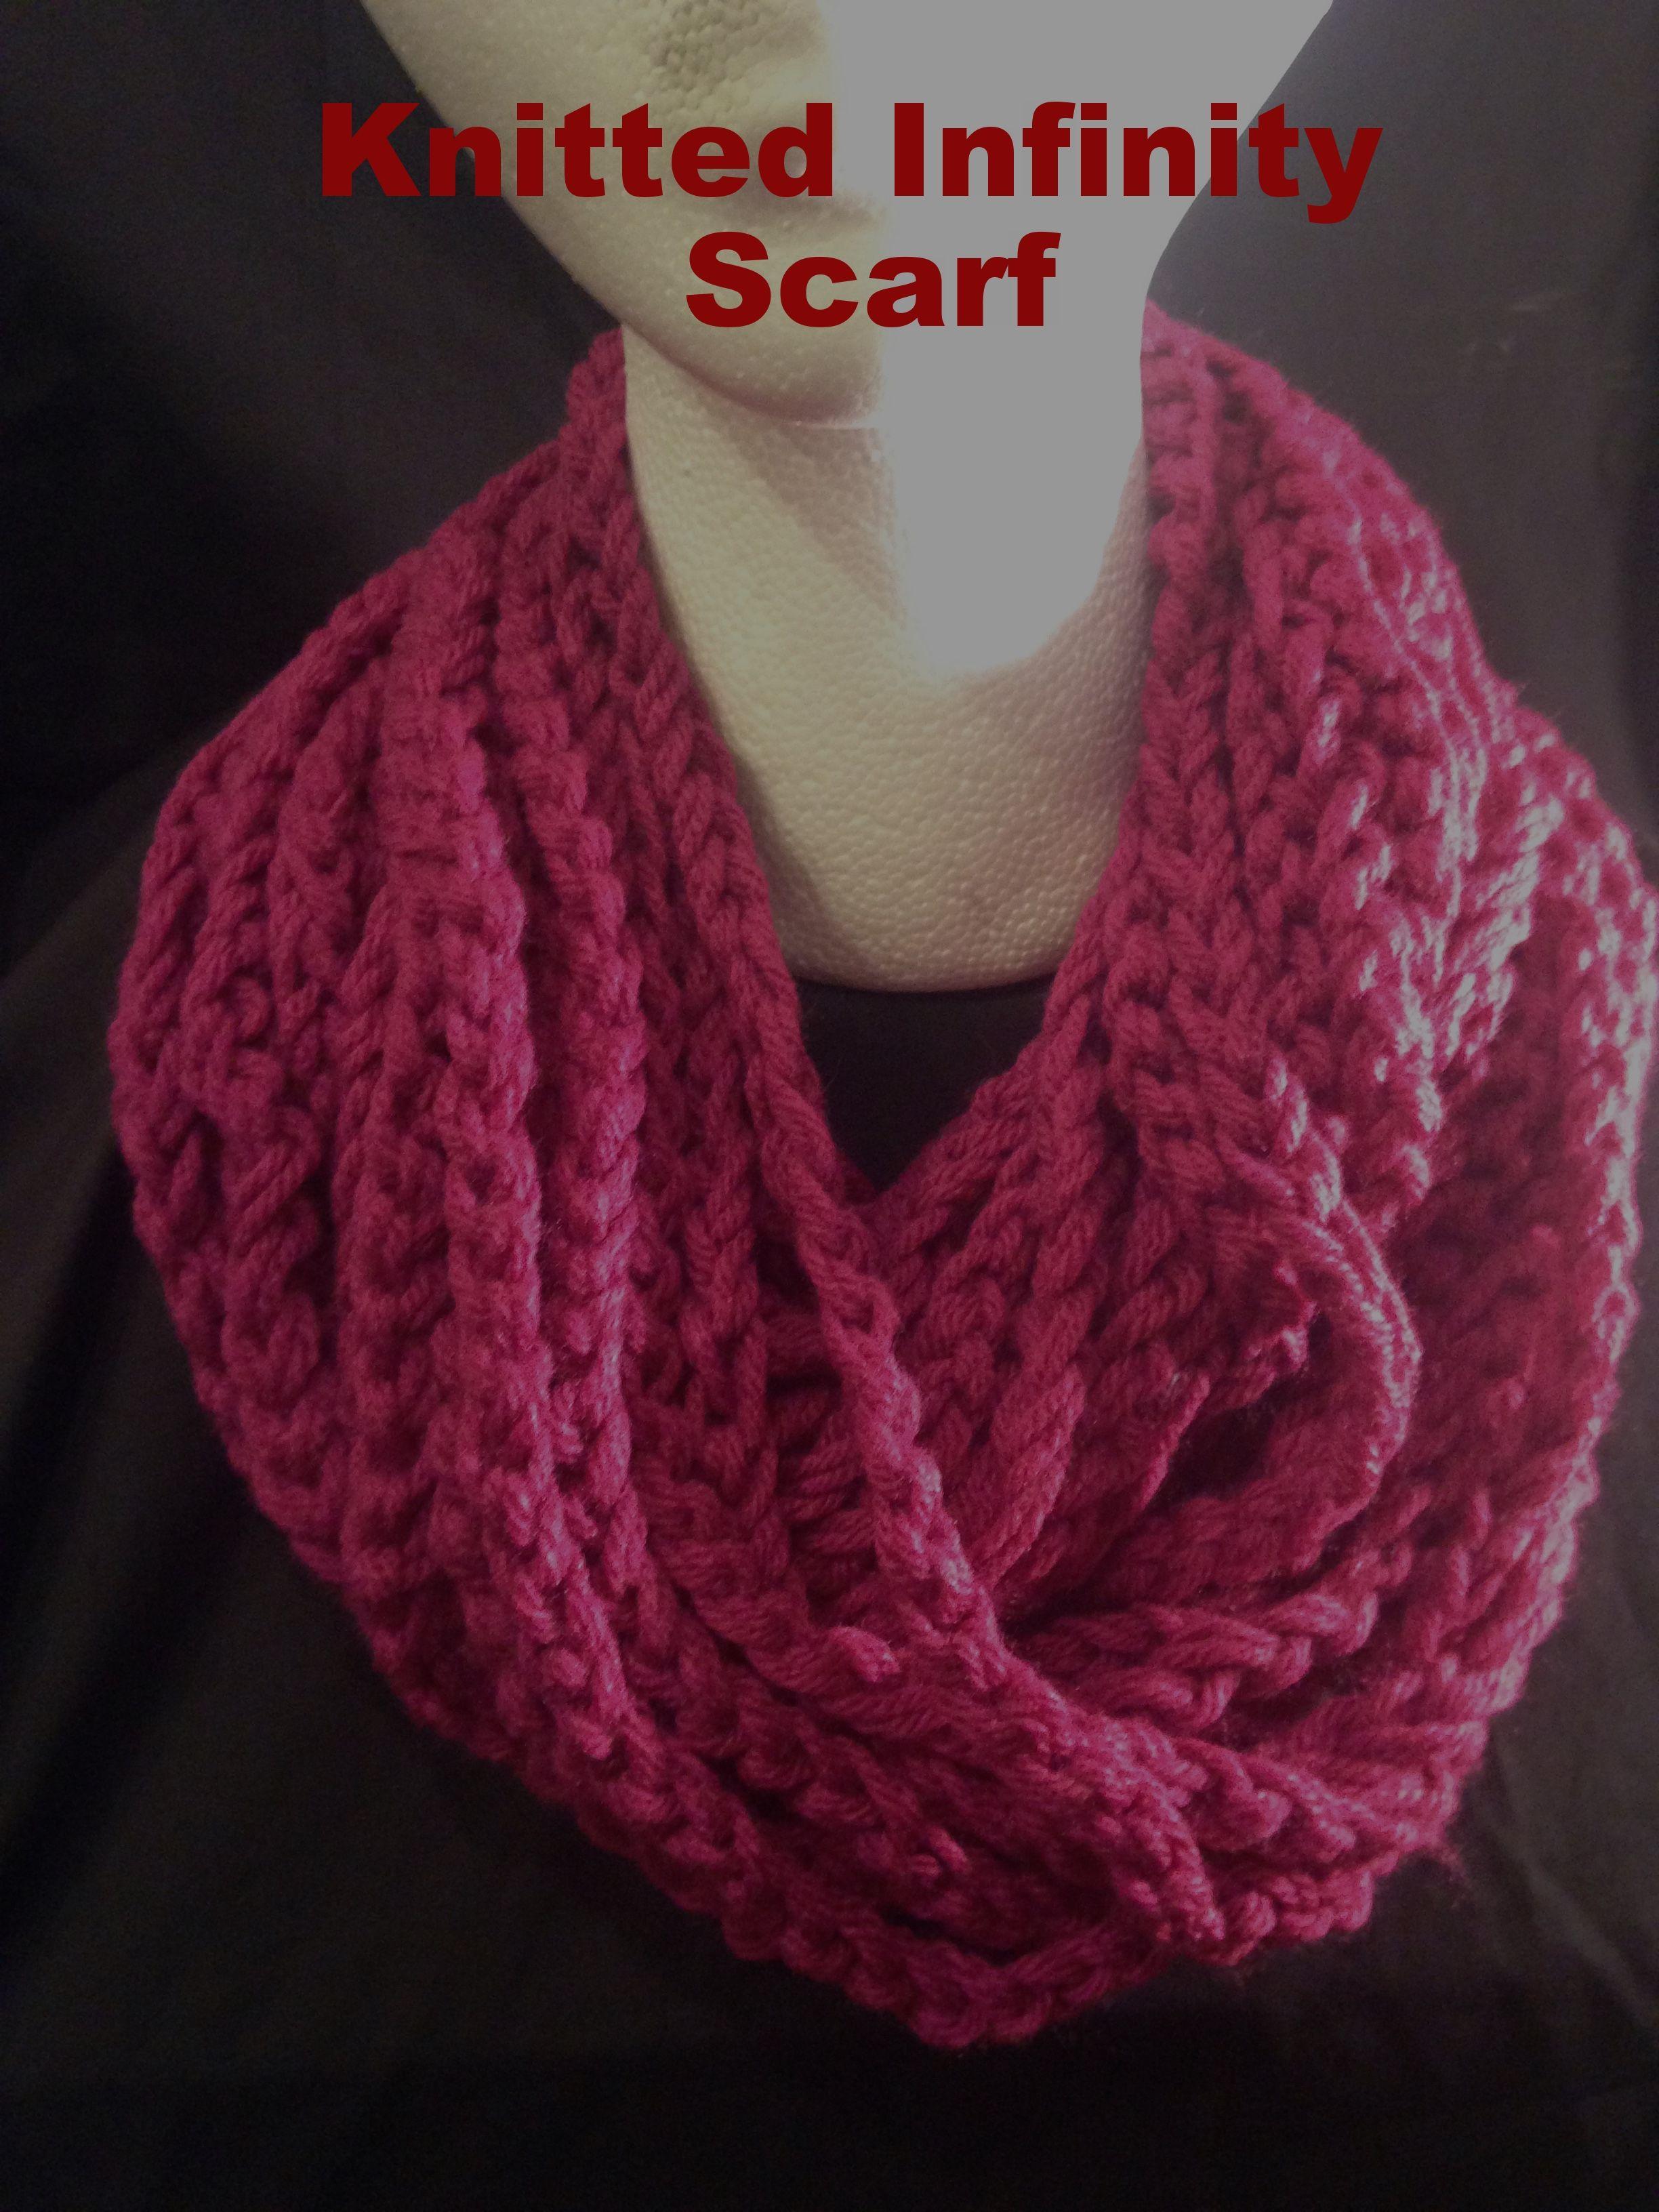 Yarn infinity scarf hand knitted fuchsia blogspodcastsbook yarn infinity scarf hand knitted fuchsia bankloansurffo Choice Image